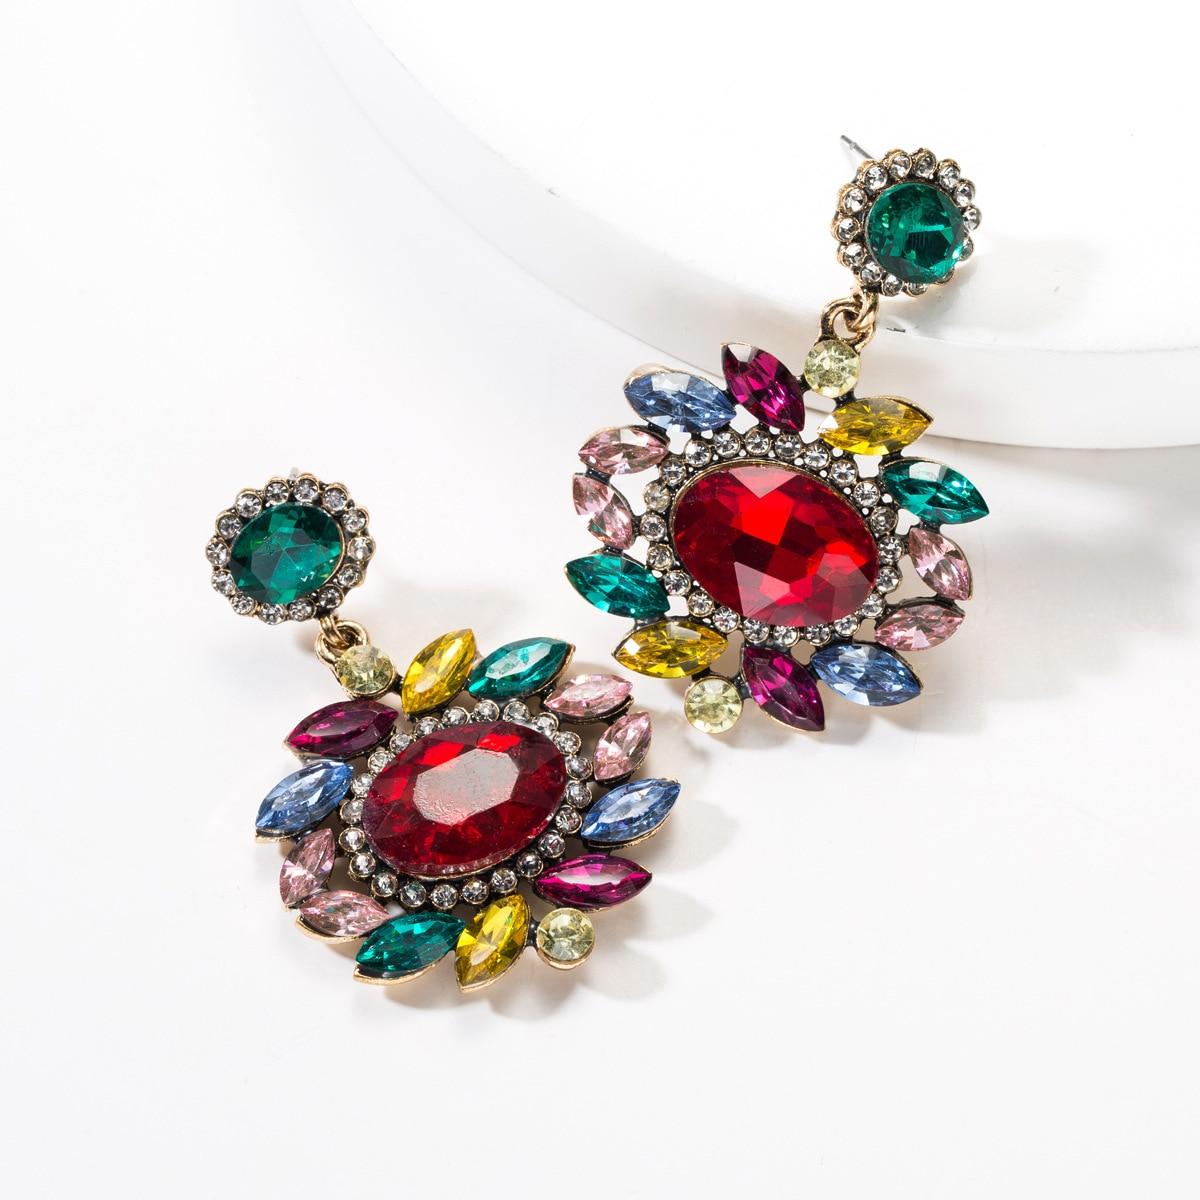 Multicolor Rhinestone Charm Cute Stud Earrings Girls Gifts Fashion Jewelry 2019 New Brand,Multicolour